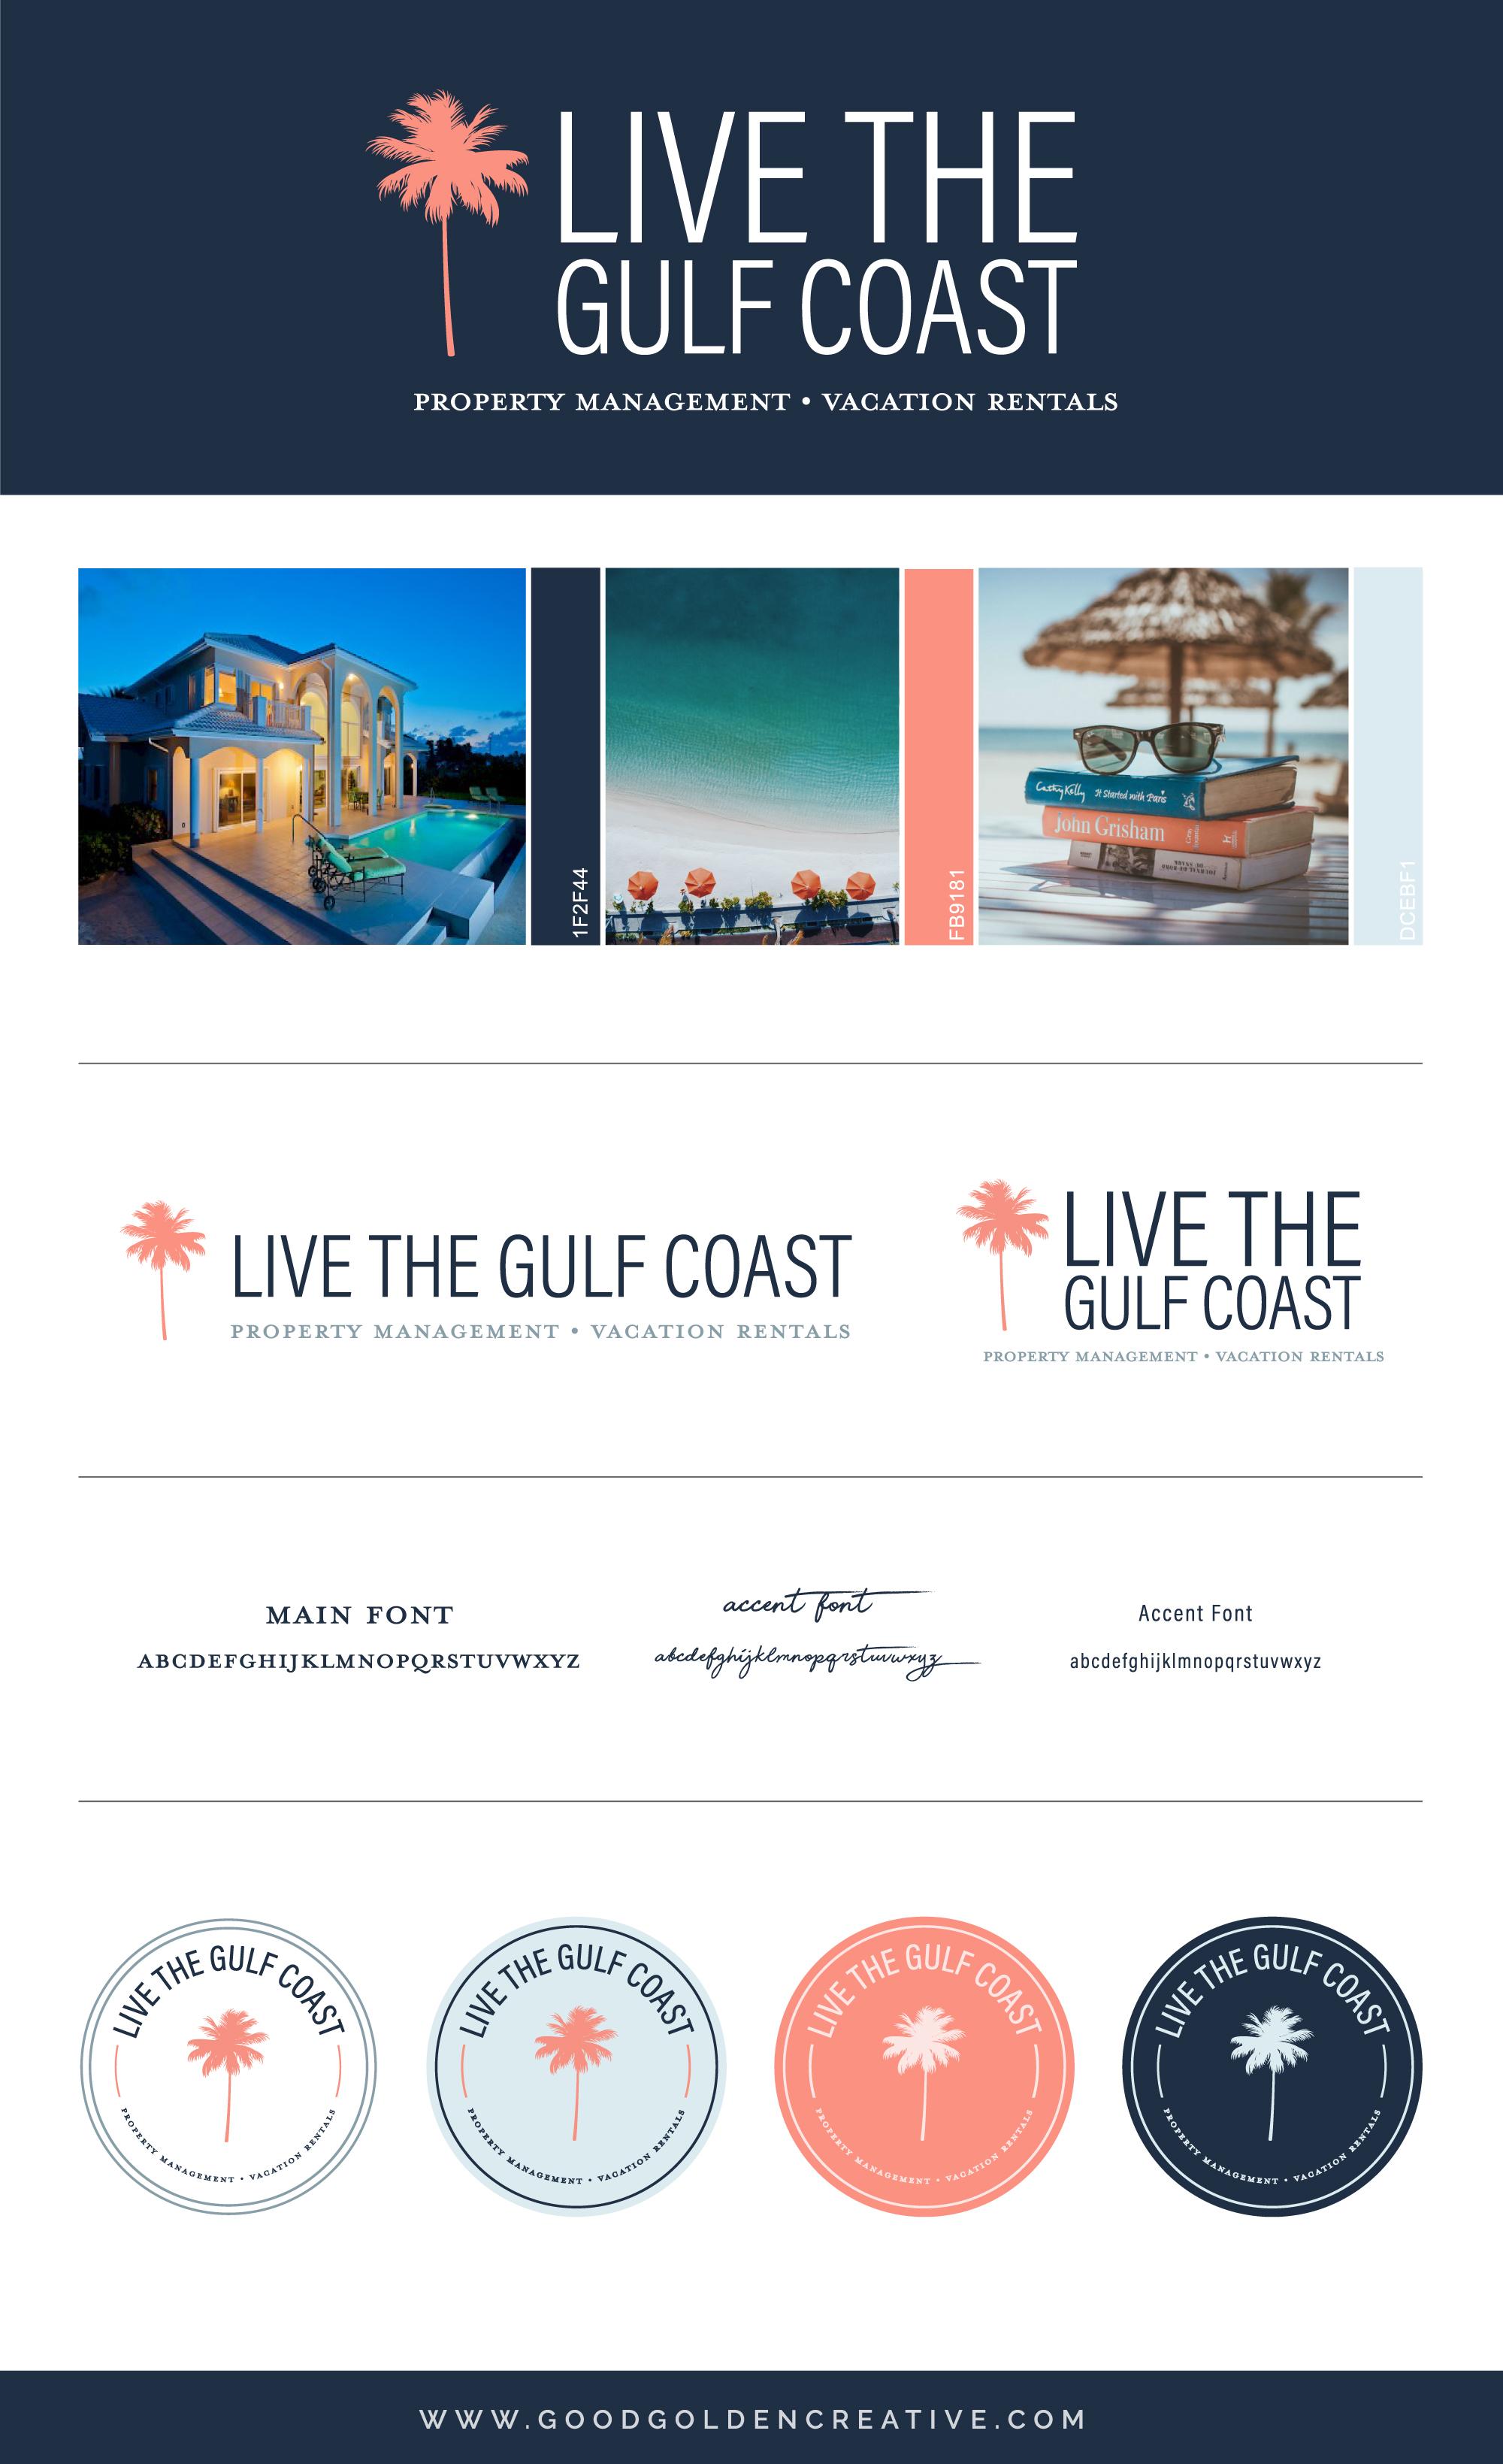 Live-the-Gulf-Coast-Brand-Board.jpg